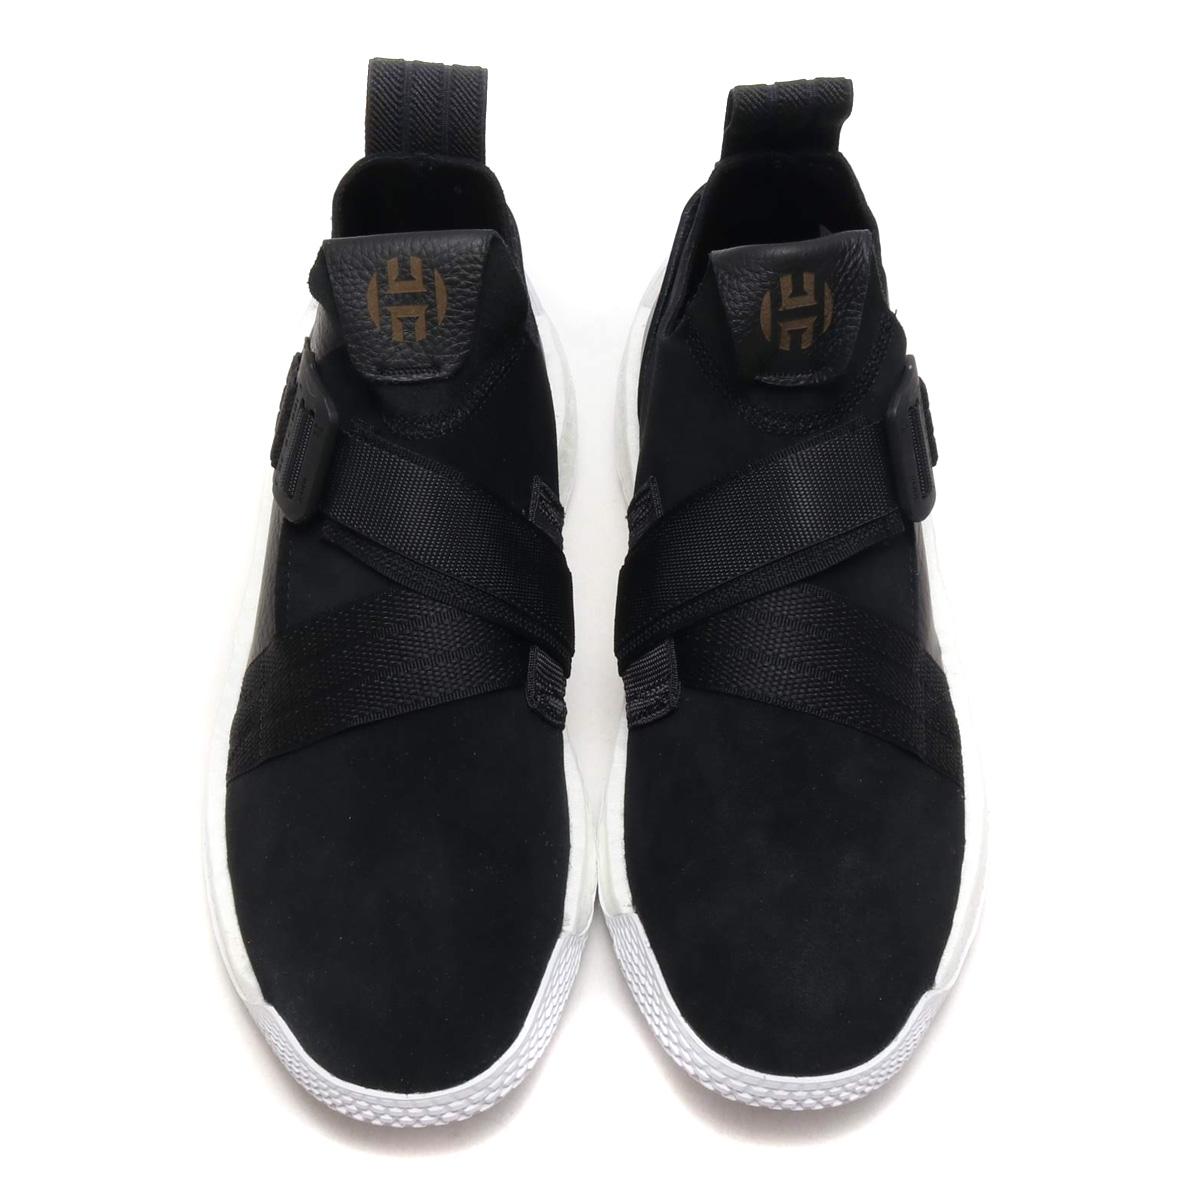 a0d48066a70 adidas Harden LS 2 BUCKLE (Adidas Arthur Harden LS2 buckle) Core Black Running  White Gold Met 18FW-I